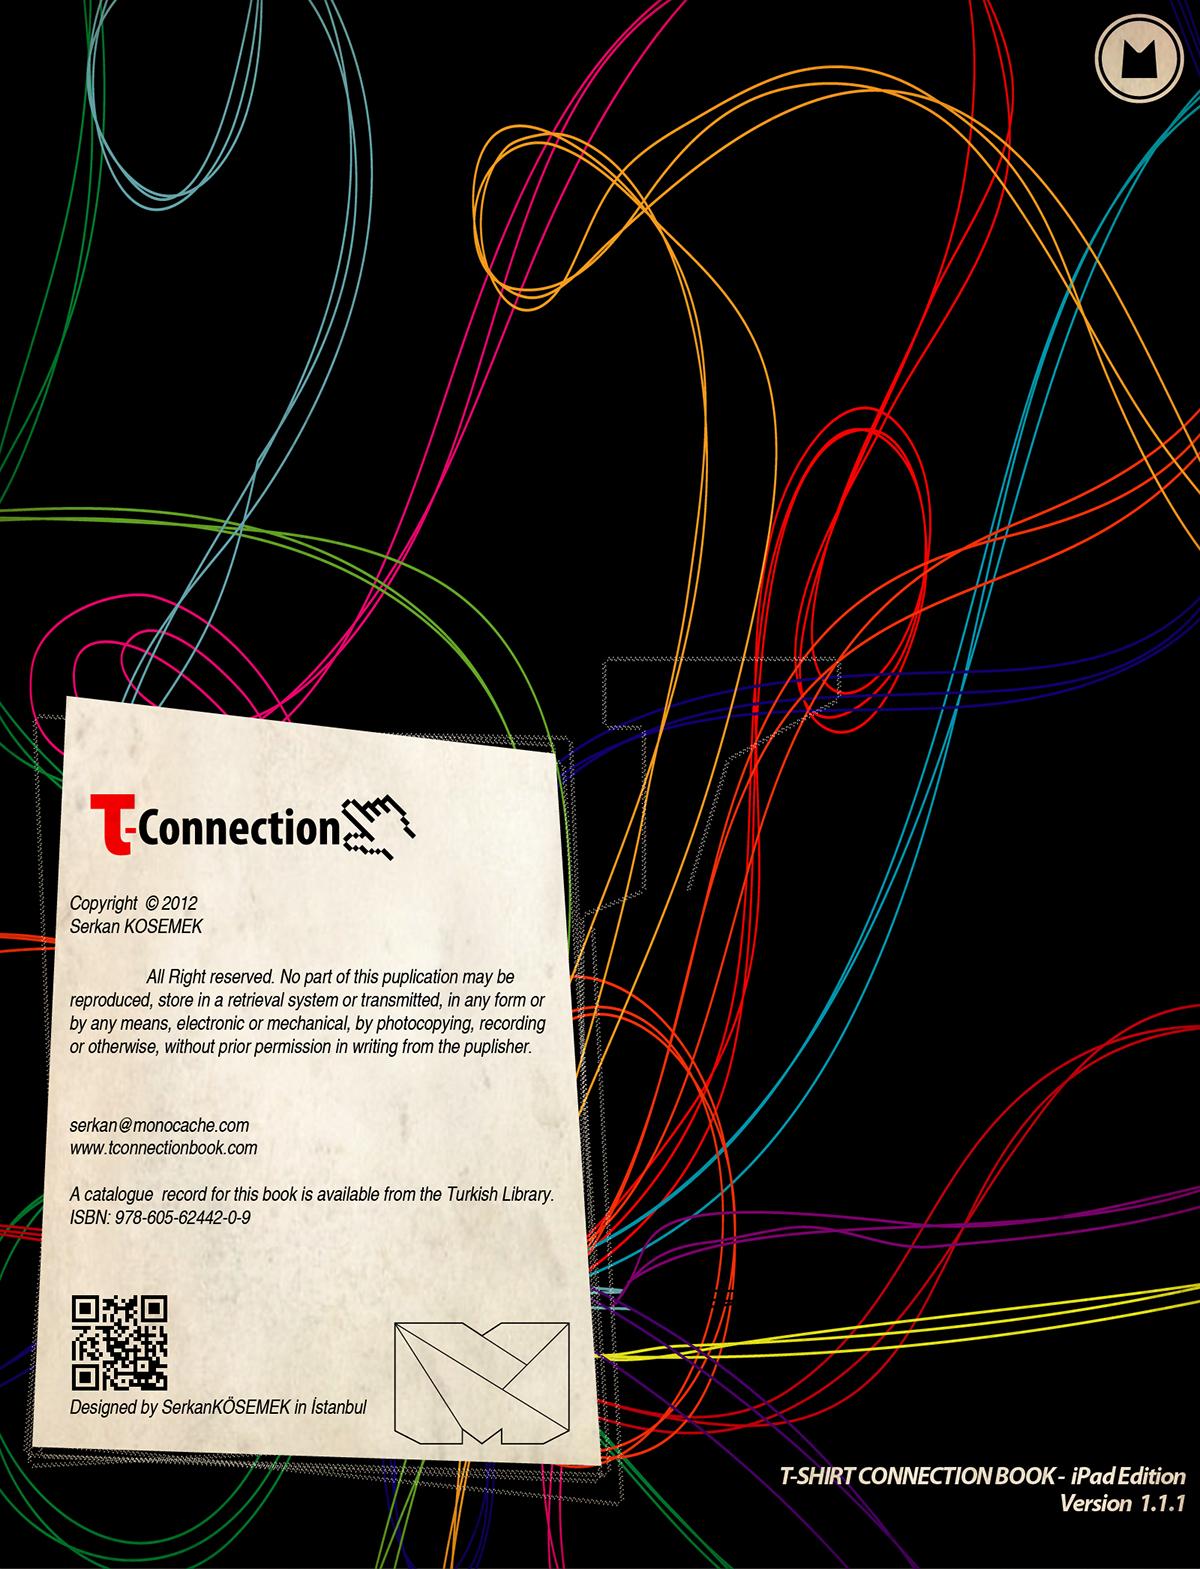 T shirt design app for ipad - Https Itunes Apple Com Us App T Shirt Connection Id583829315 Ls 1 Mt 8